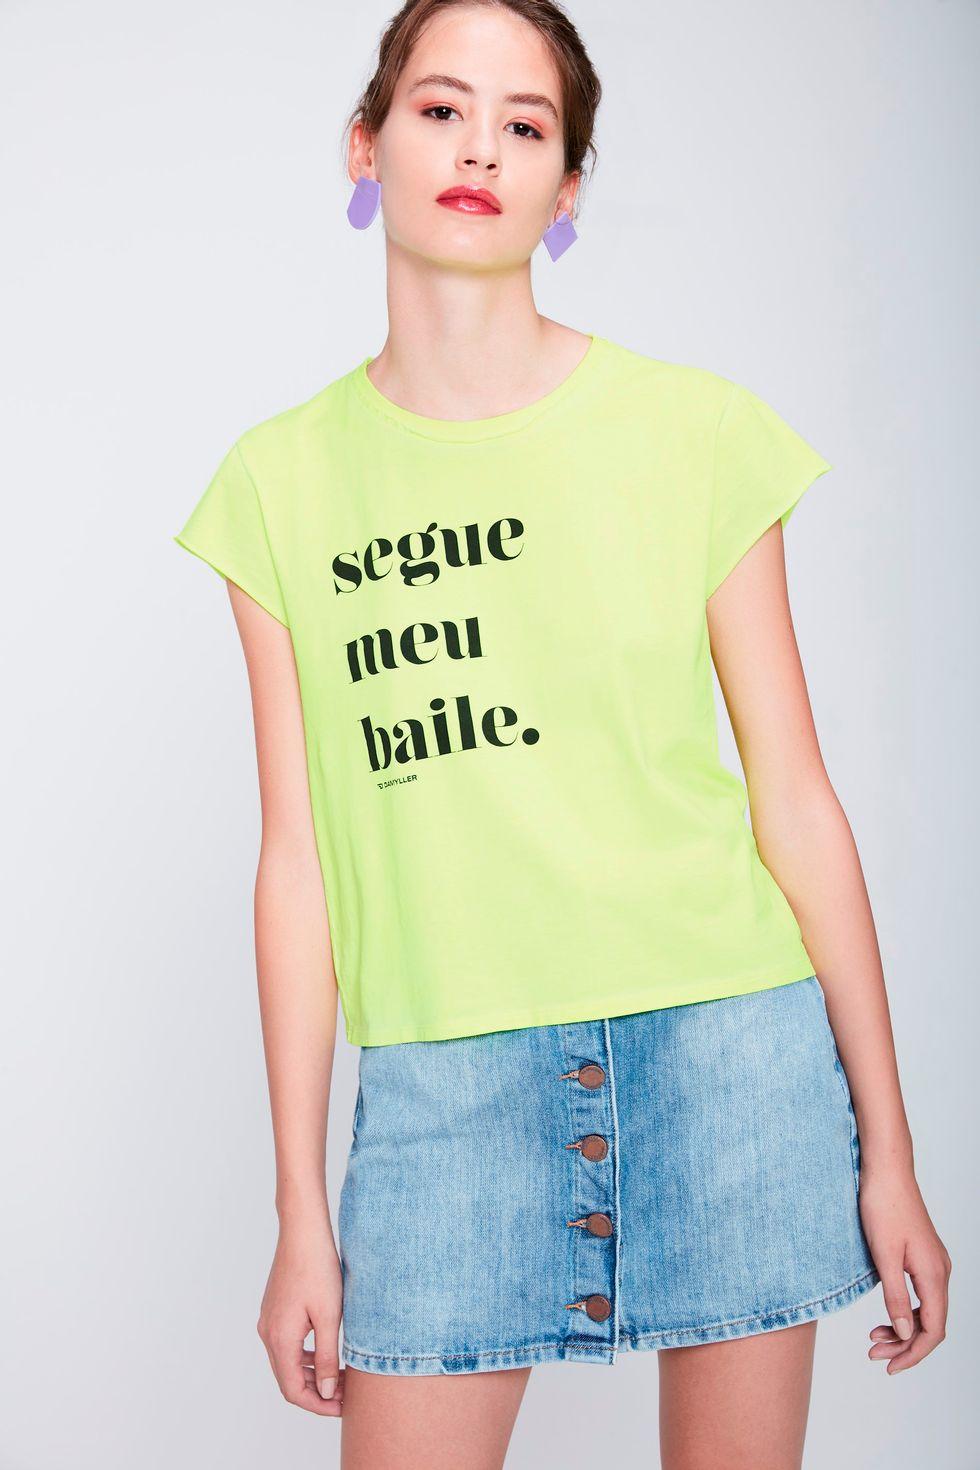 Camiseta-Neon-Segue-Meu-Baile-Feminina-Frente--